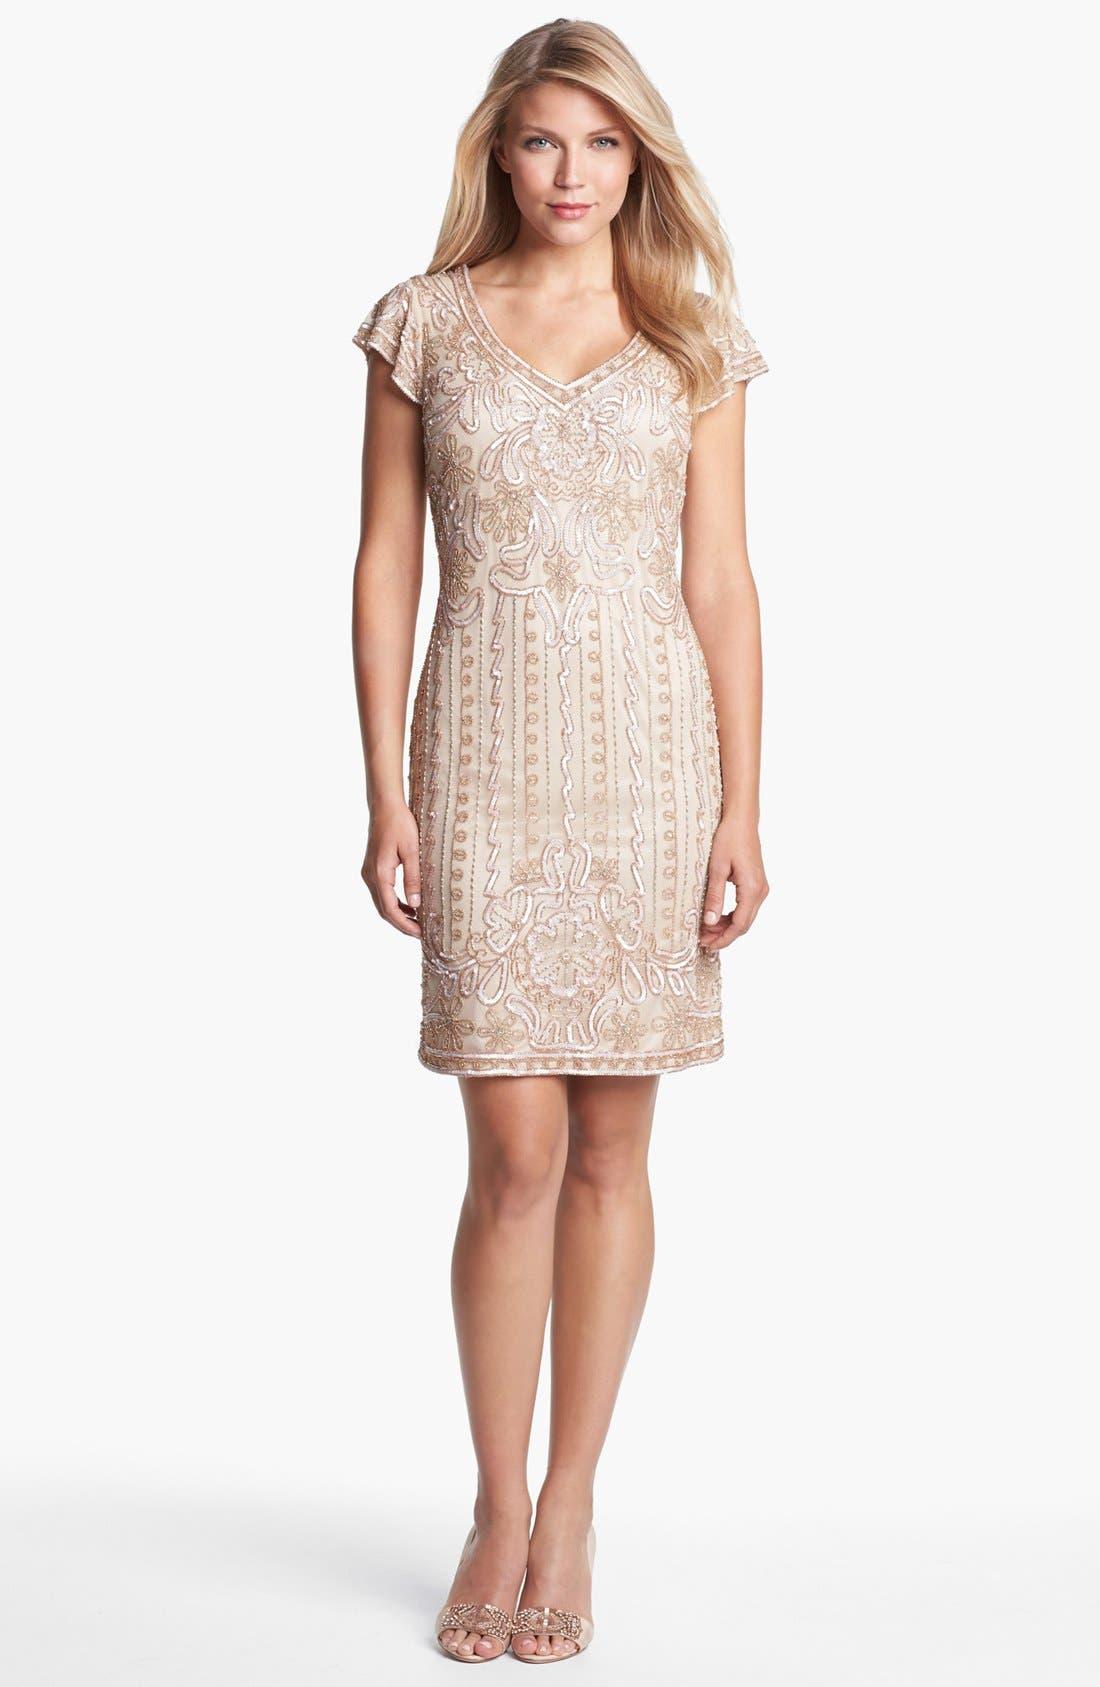 Alternate Image 1 Selected - J Kara Embellished Mesh Sheath Dress (Petite)